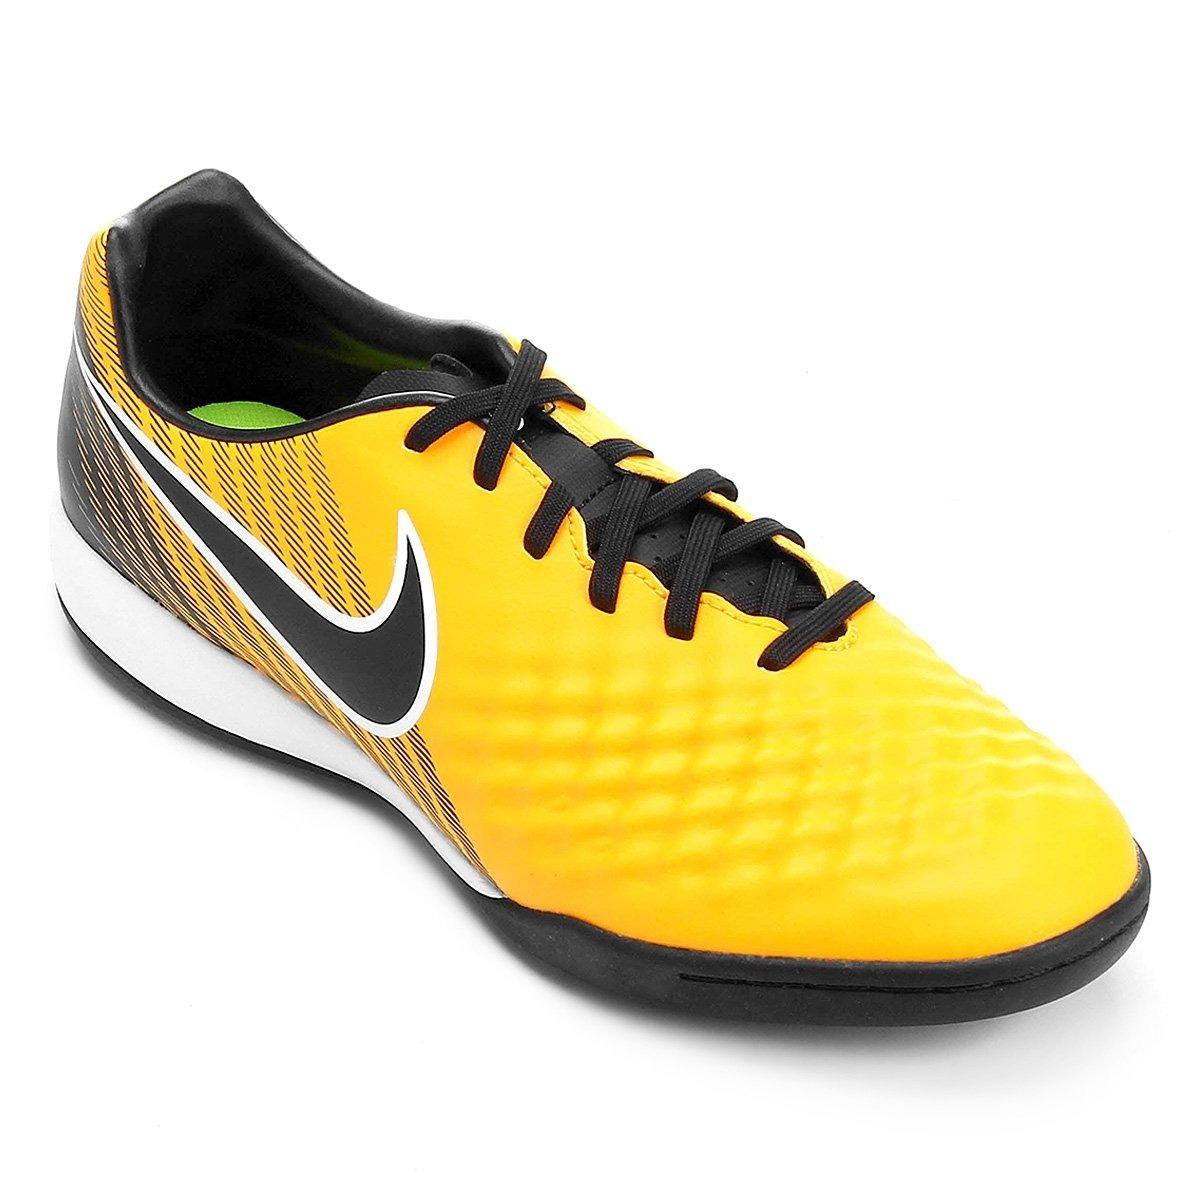 11304034d9963 Chuteira Nike Magistax Onda Ii Tf Society - Original - R  229